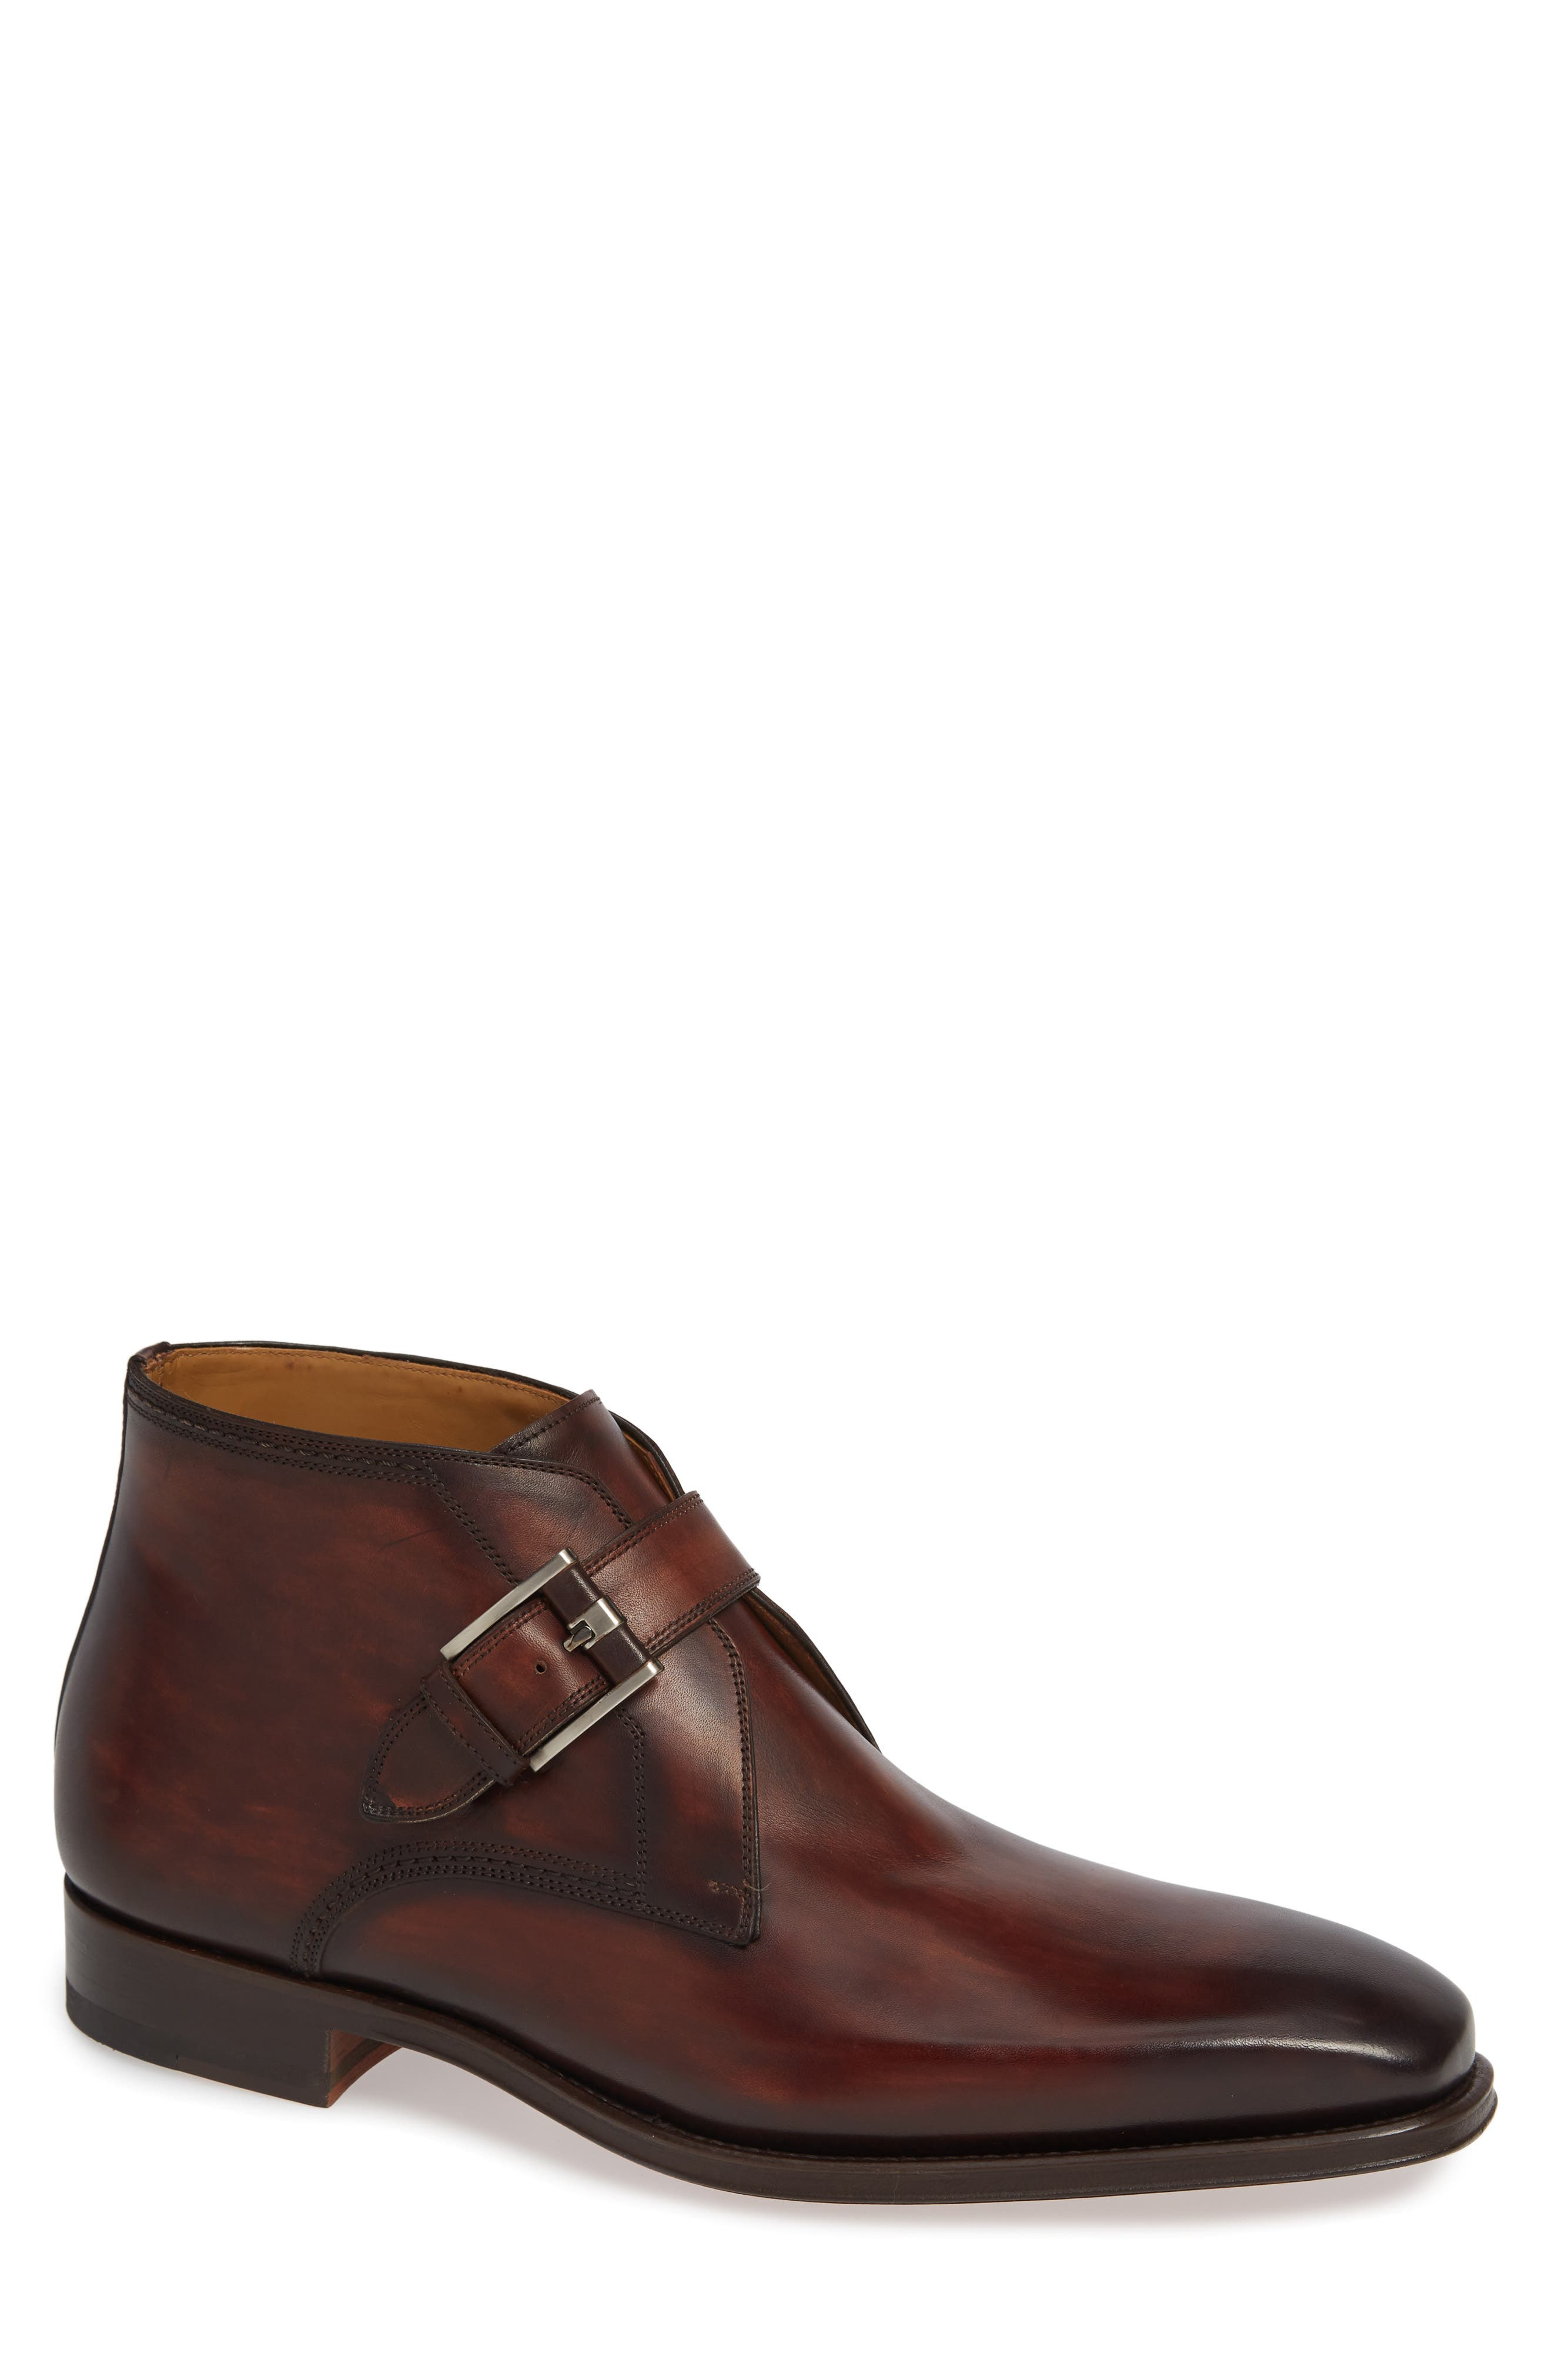 Magnanni Luka Monk Strap Boot, Brown